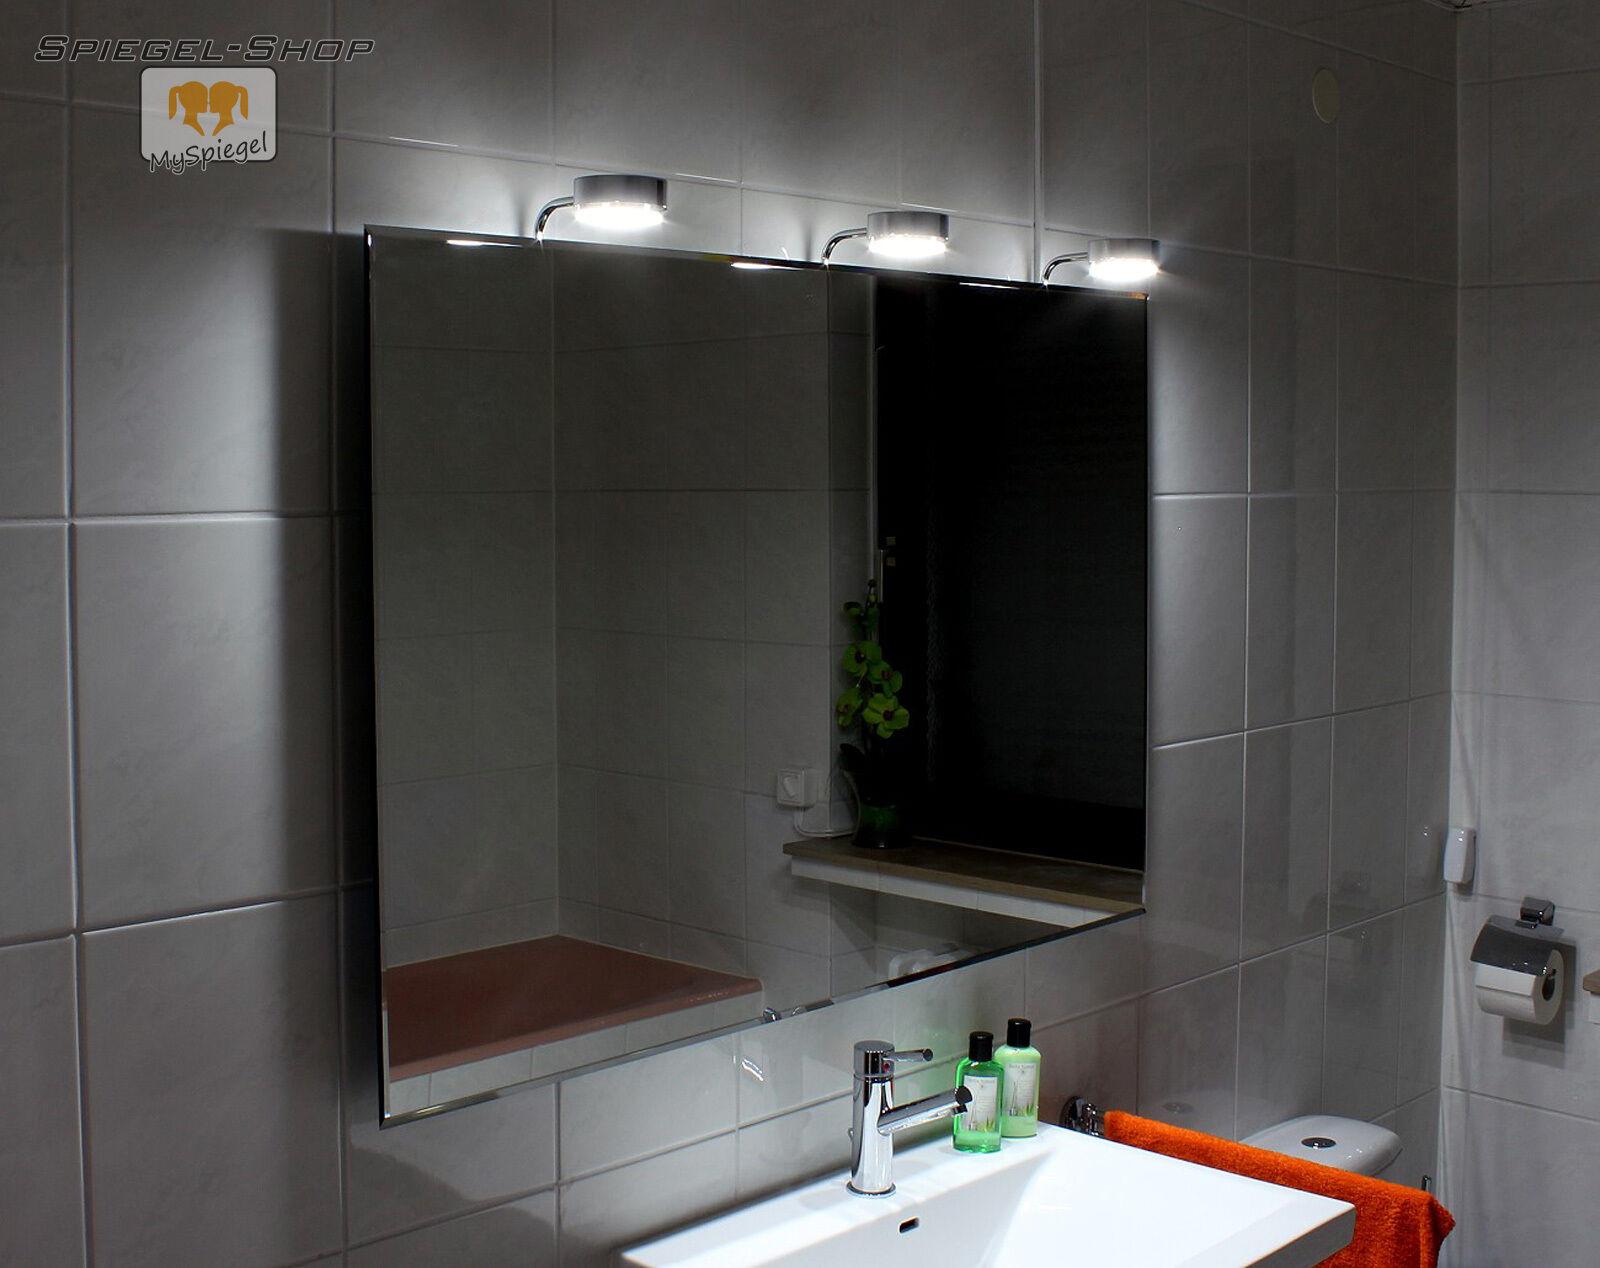 COTNAR LED LEUCHT BELEUCHTETER BAD SPIEGEL MIT STEILFACETTE 130x70CM 3 LAMPEN